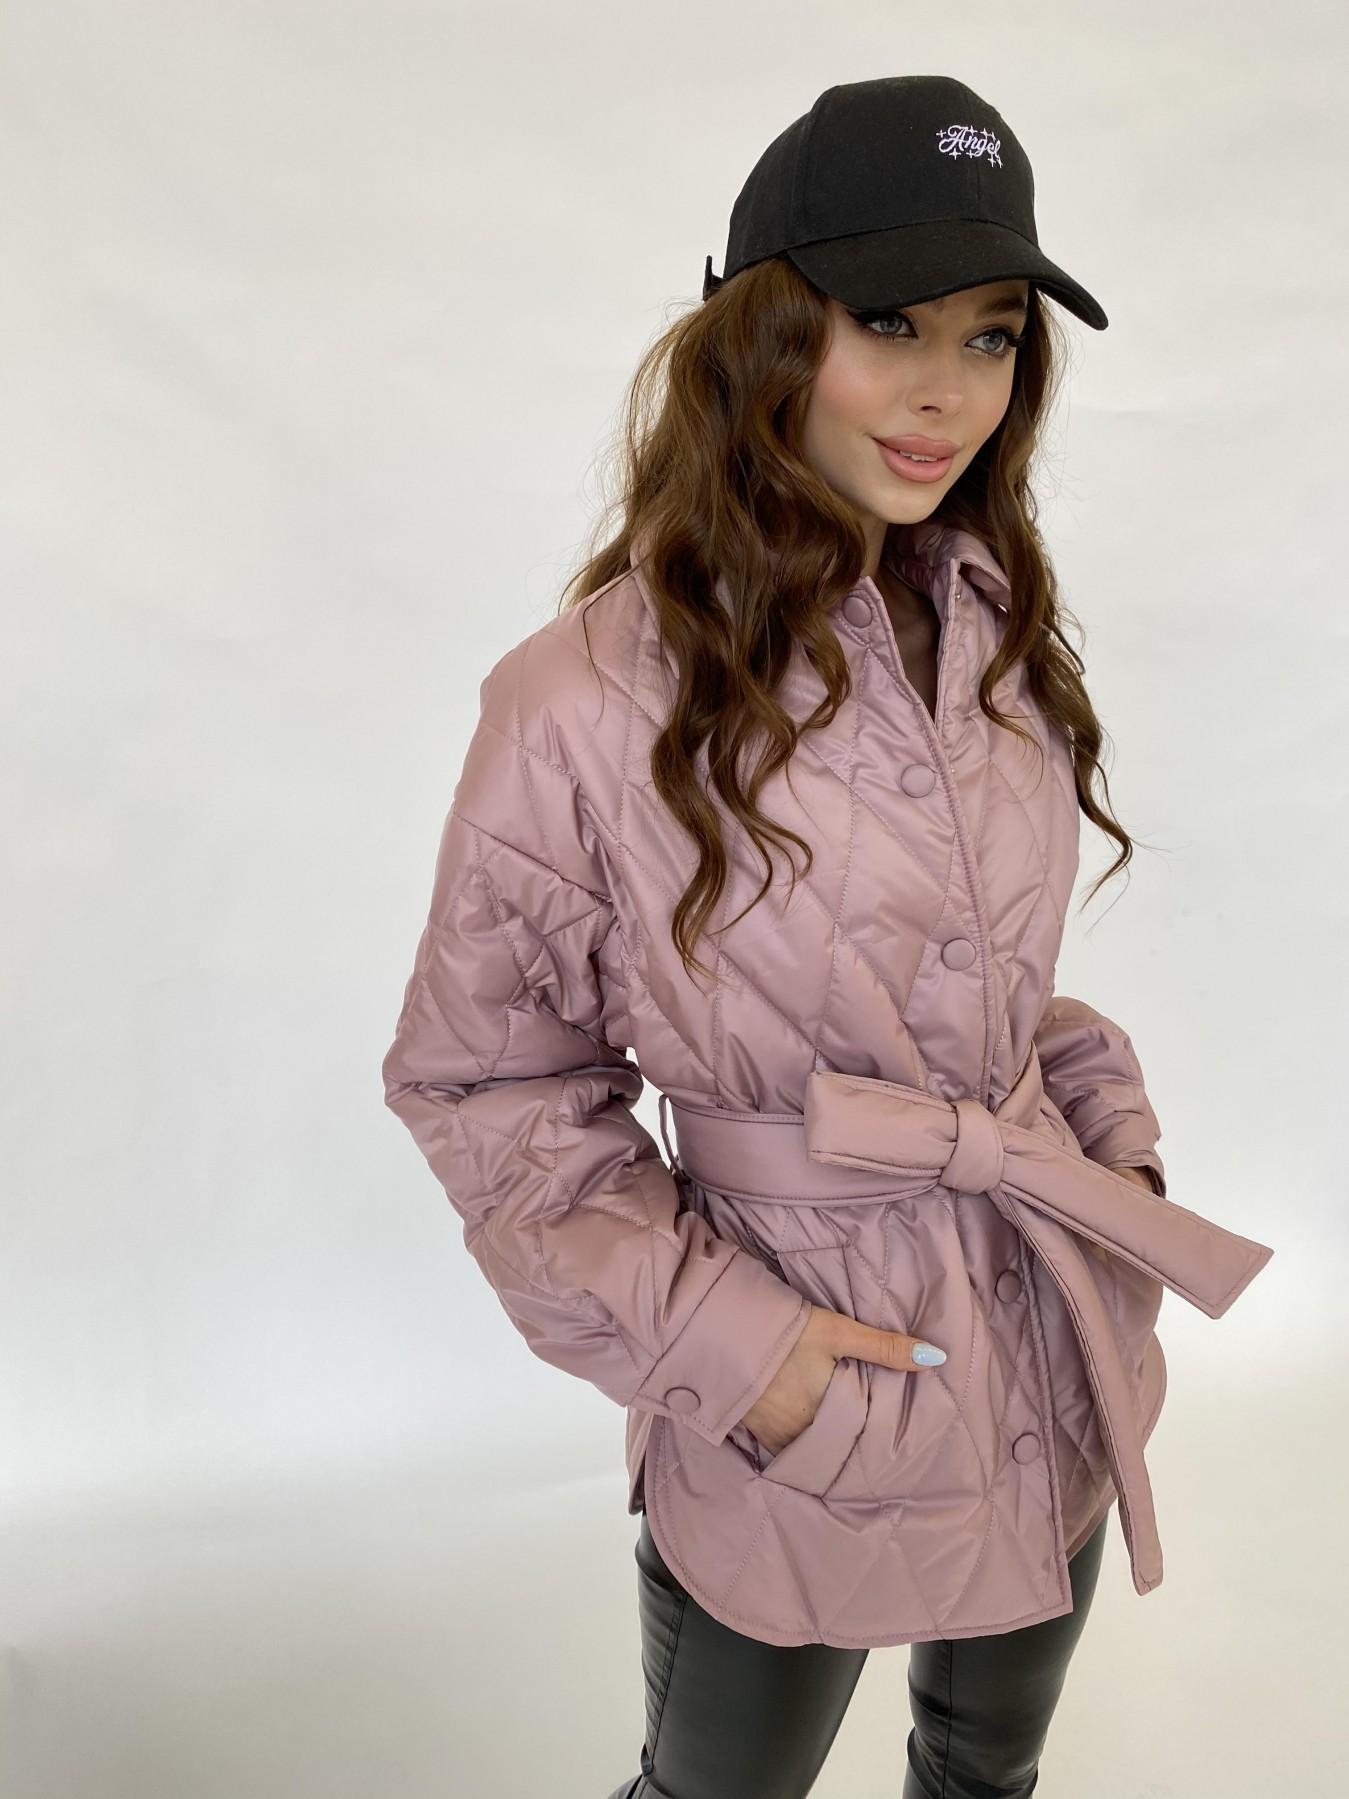 Моно  куртка из плащевой ткани Gloria 11081 АРТ. 47647 Цвет: Пудра - фото 3, интернет магазин tm-modus.ru